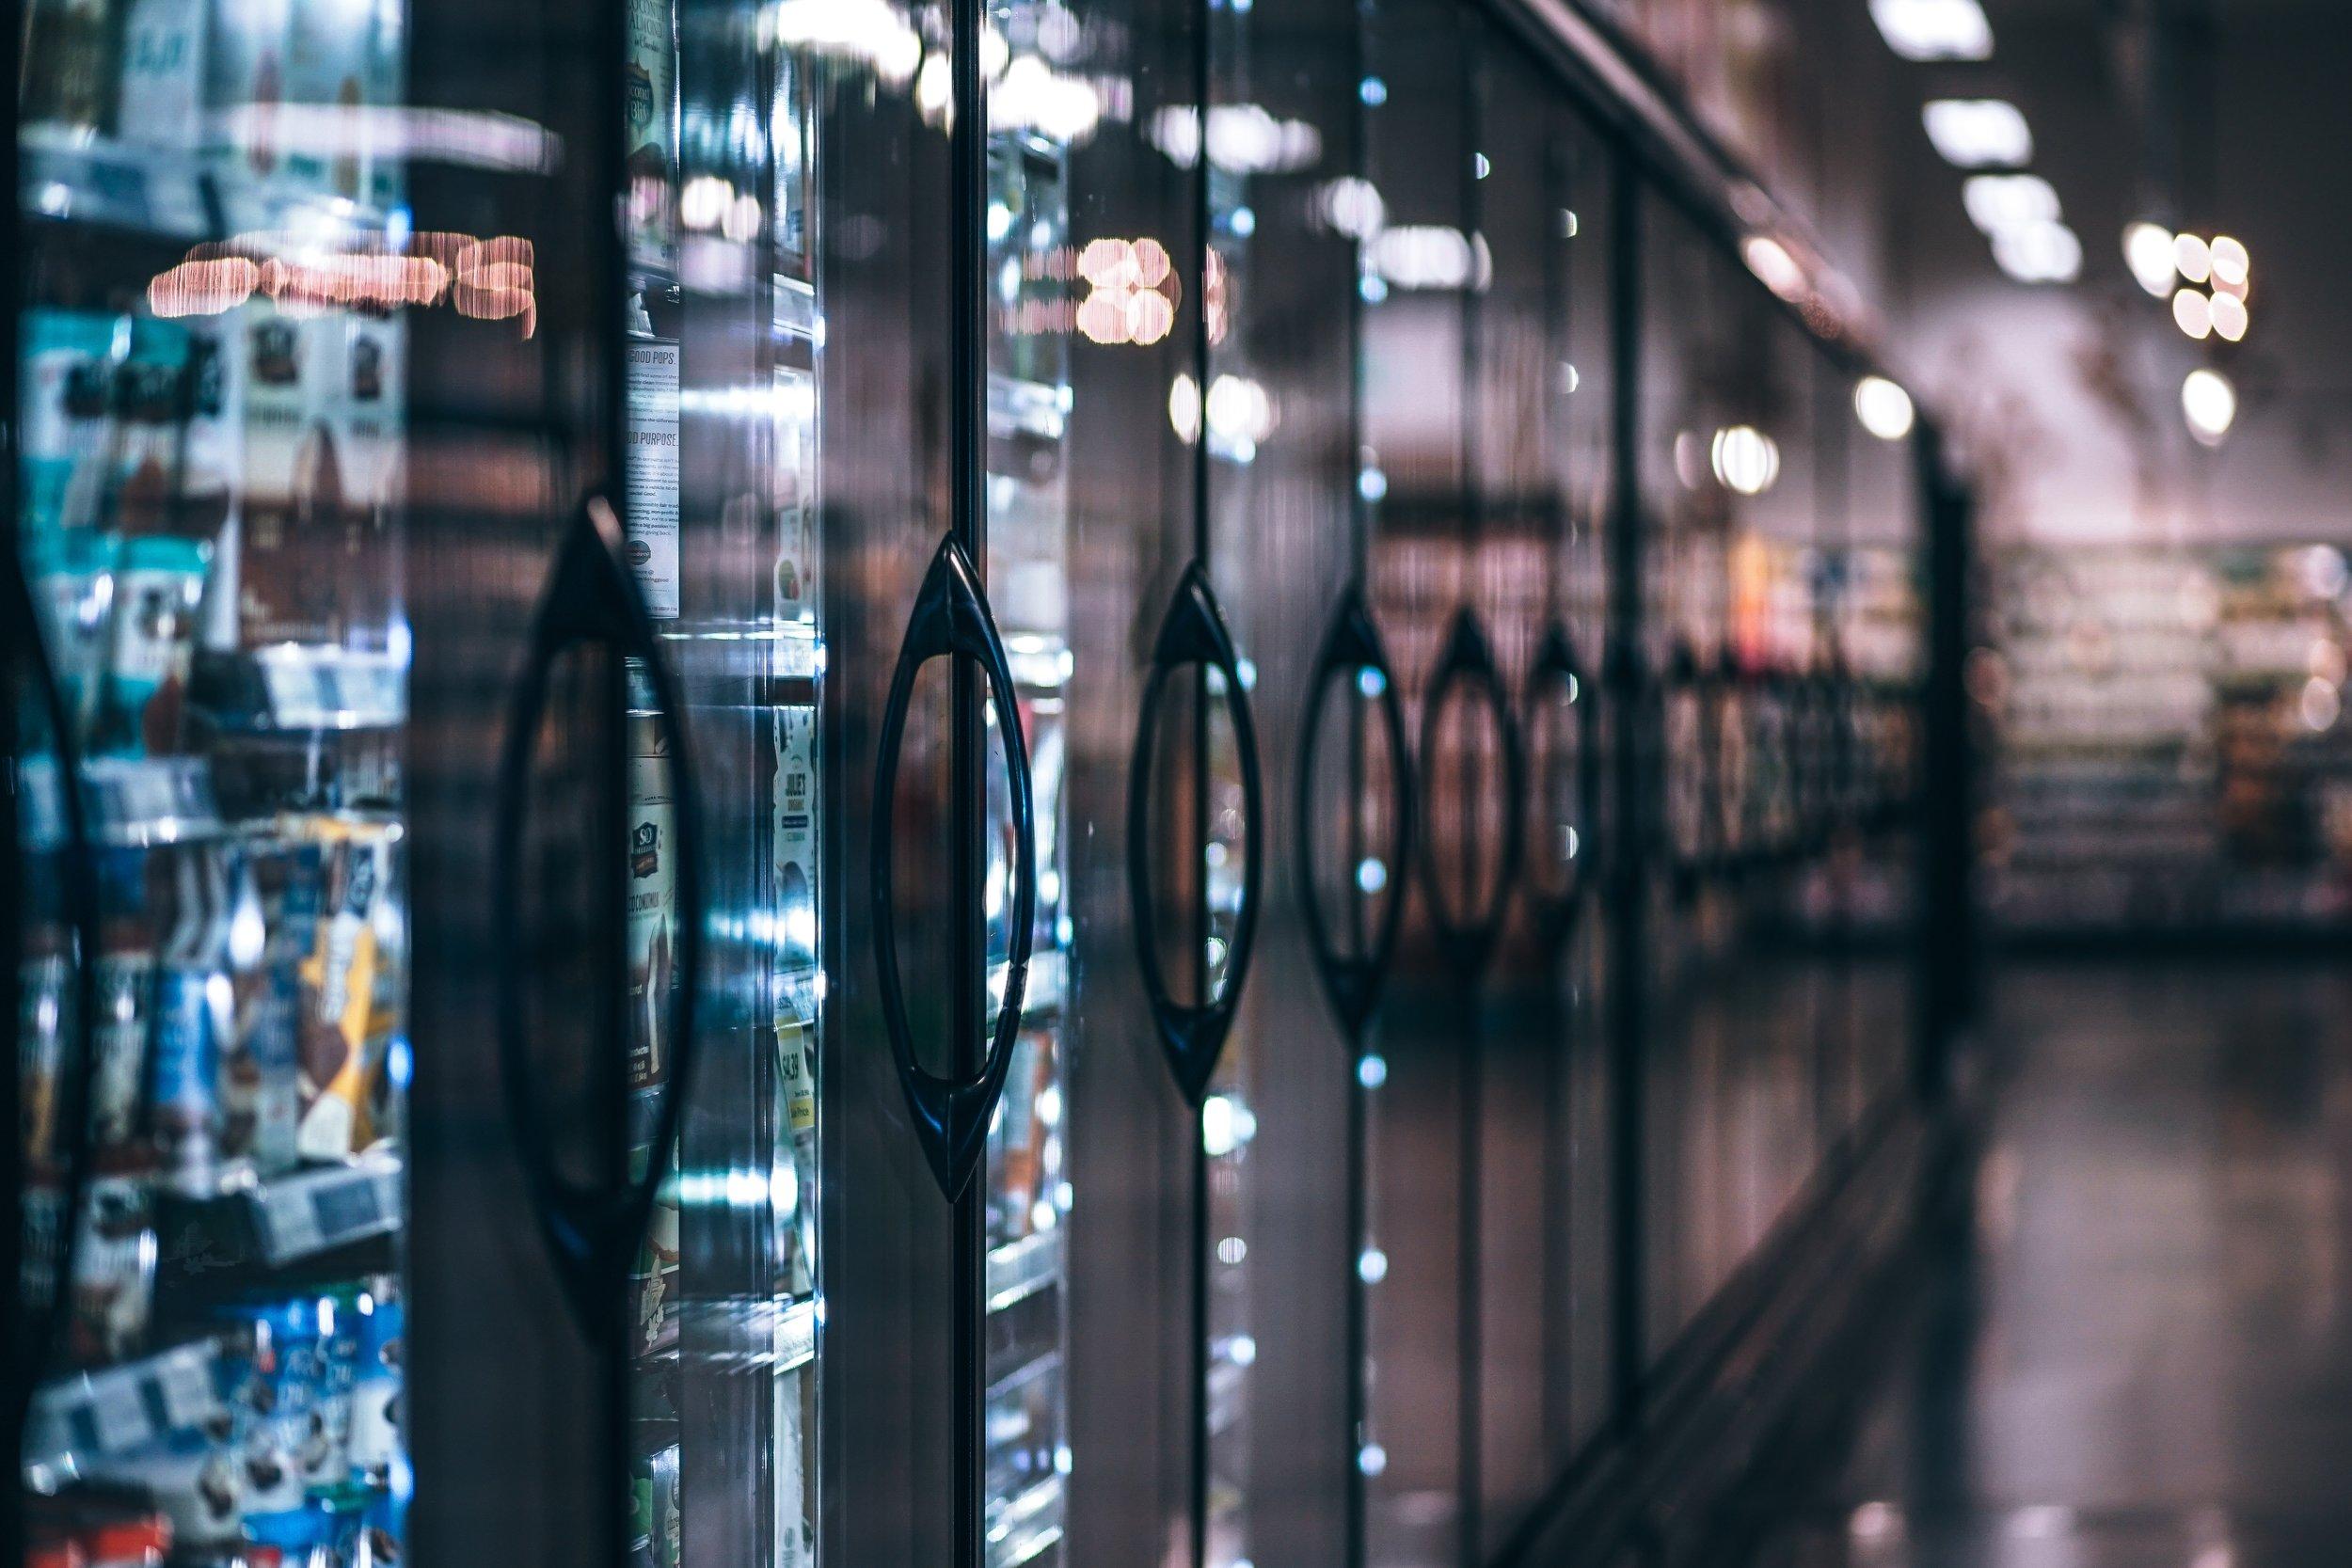 aisle-business-buy-811107.jpg